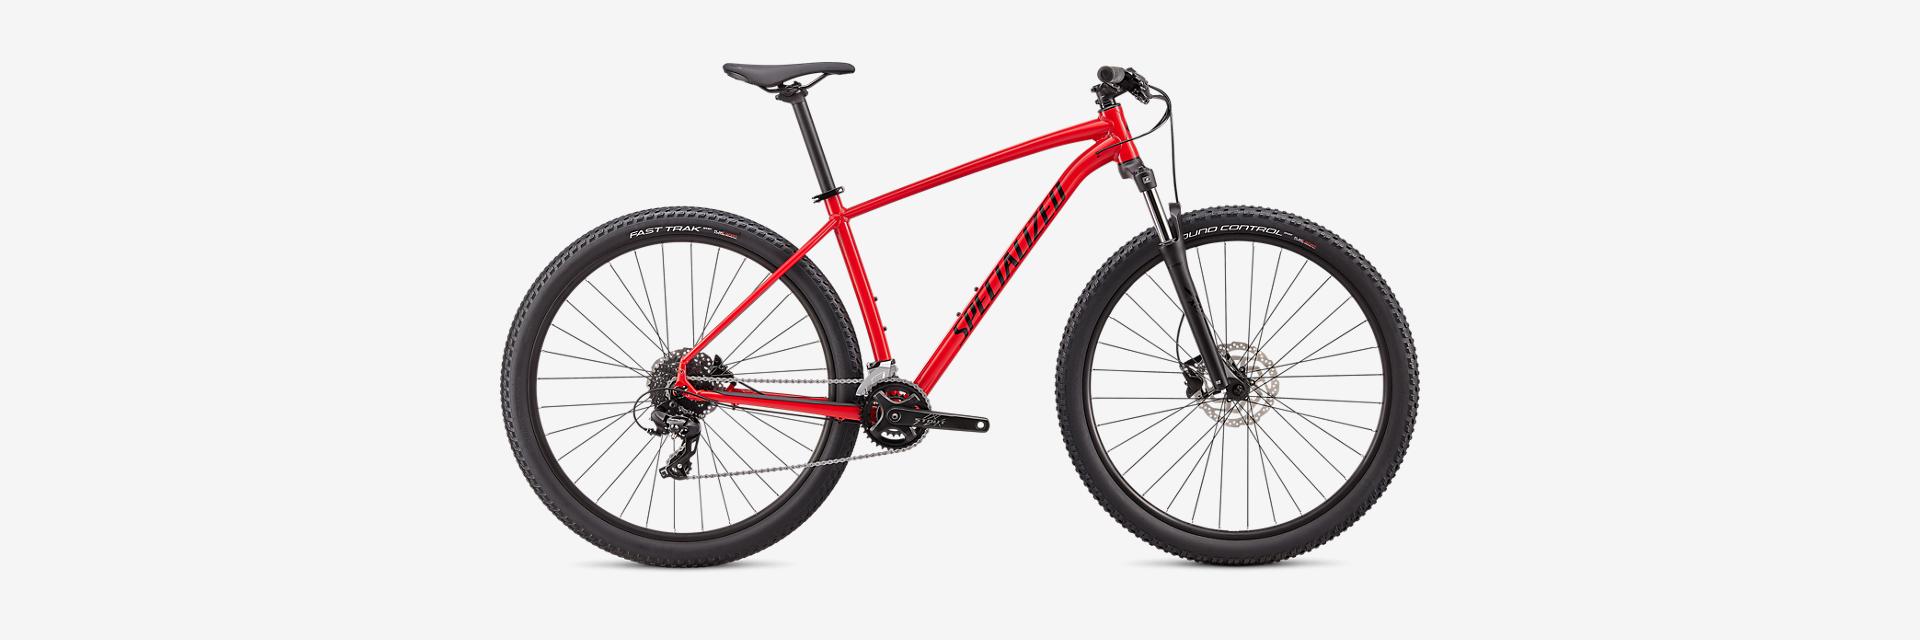 Comparativo de bicicletas MTB de entrada, Specialized Rockhopper 2020